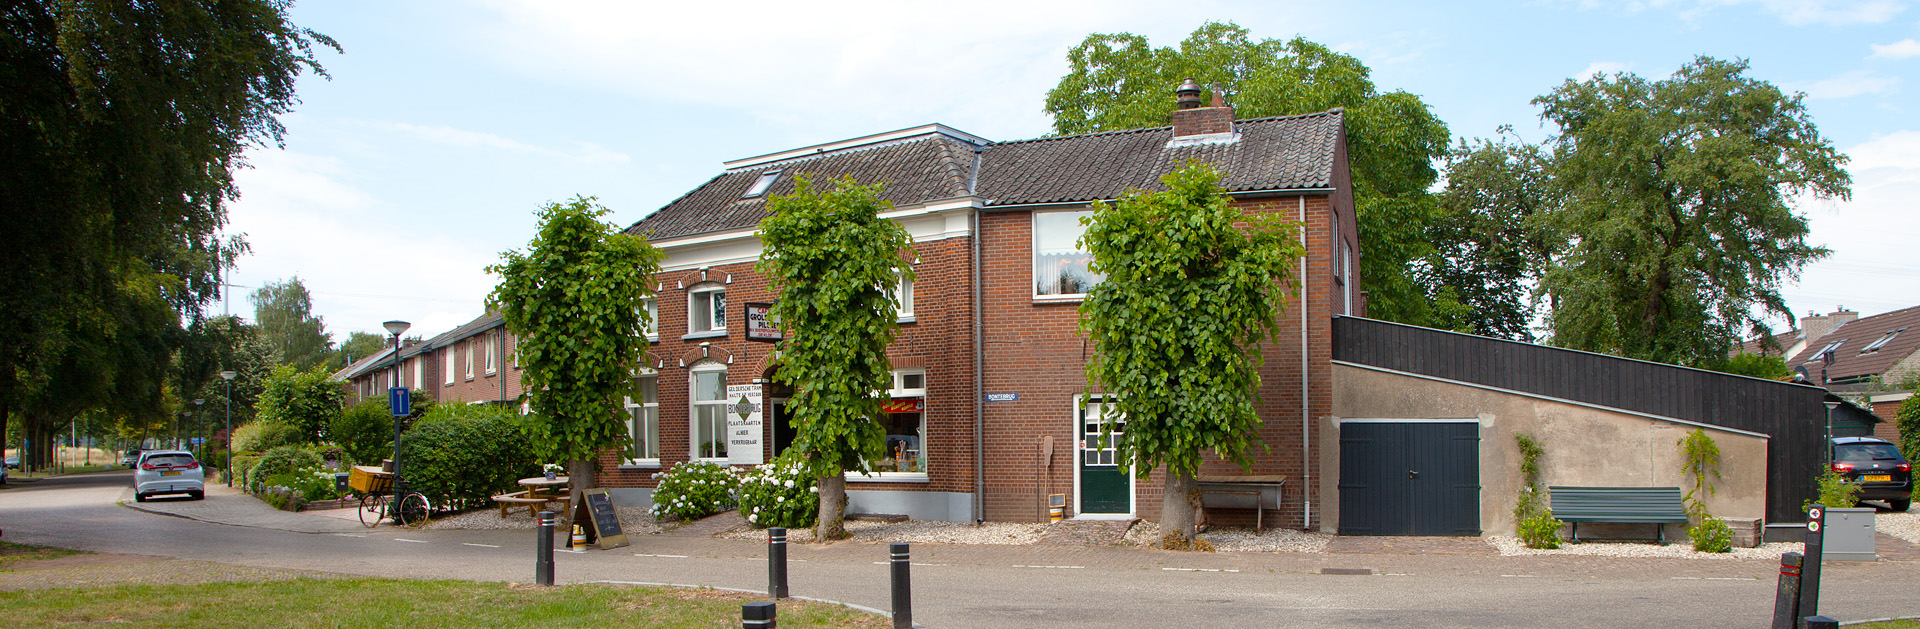 Museumwinkel Halte Bontebrug - Silvolde